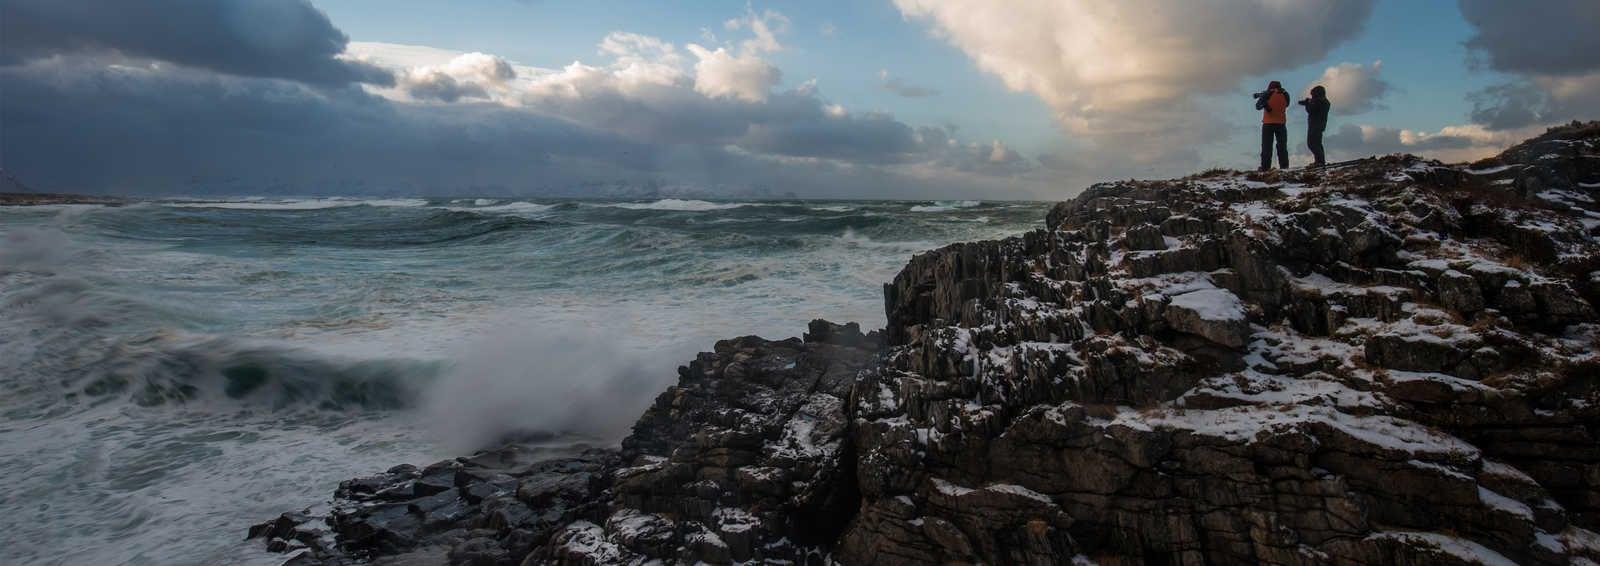 Photographing the wild seas from Andoya's wild coastline